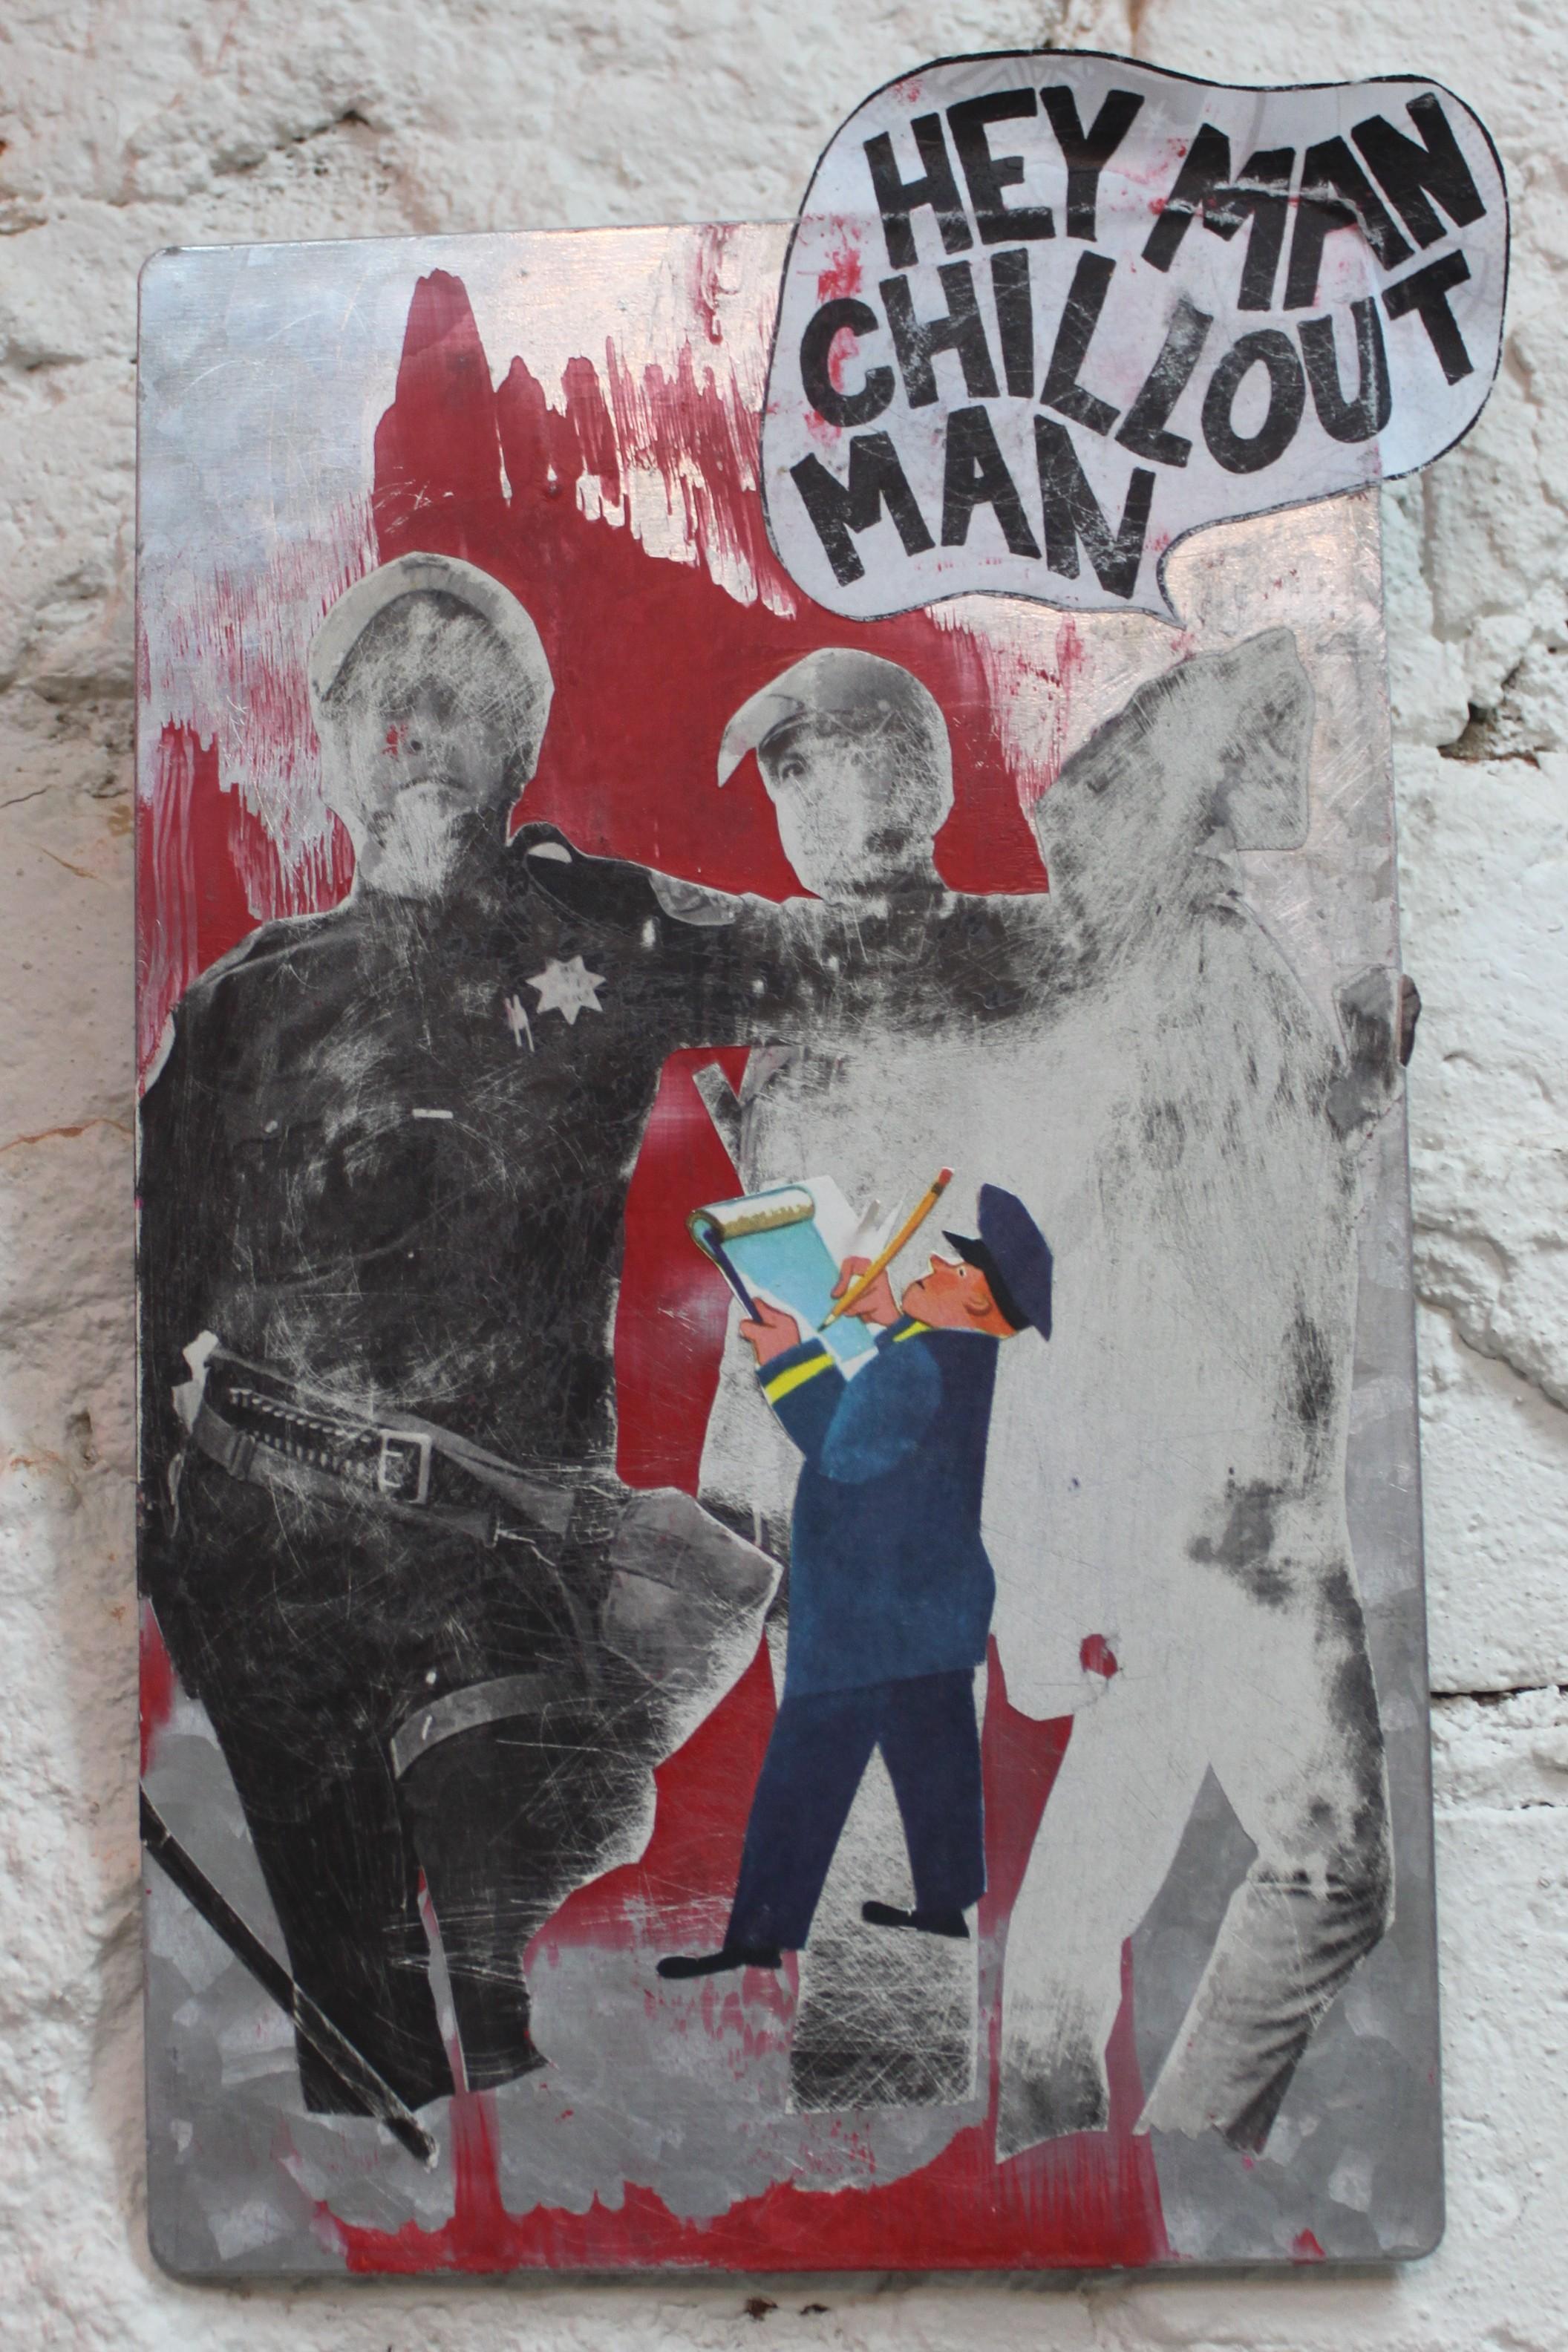 MiriamJuliannaSutton-Hey Man-mixedmedia-10x6-$100.JPG